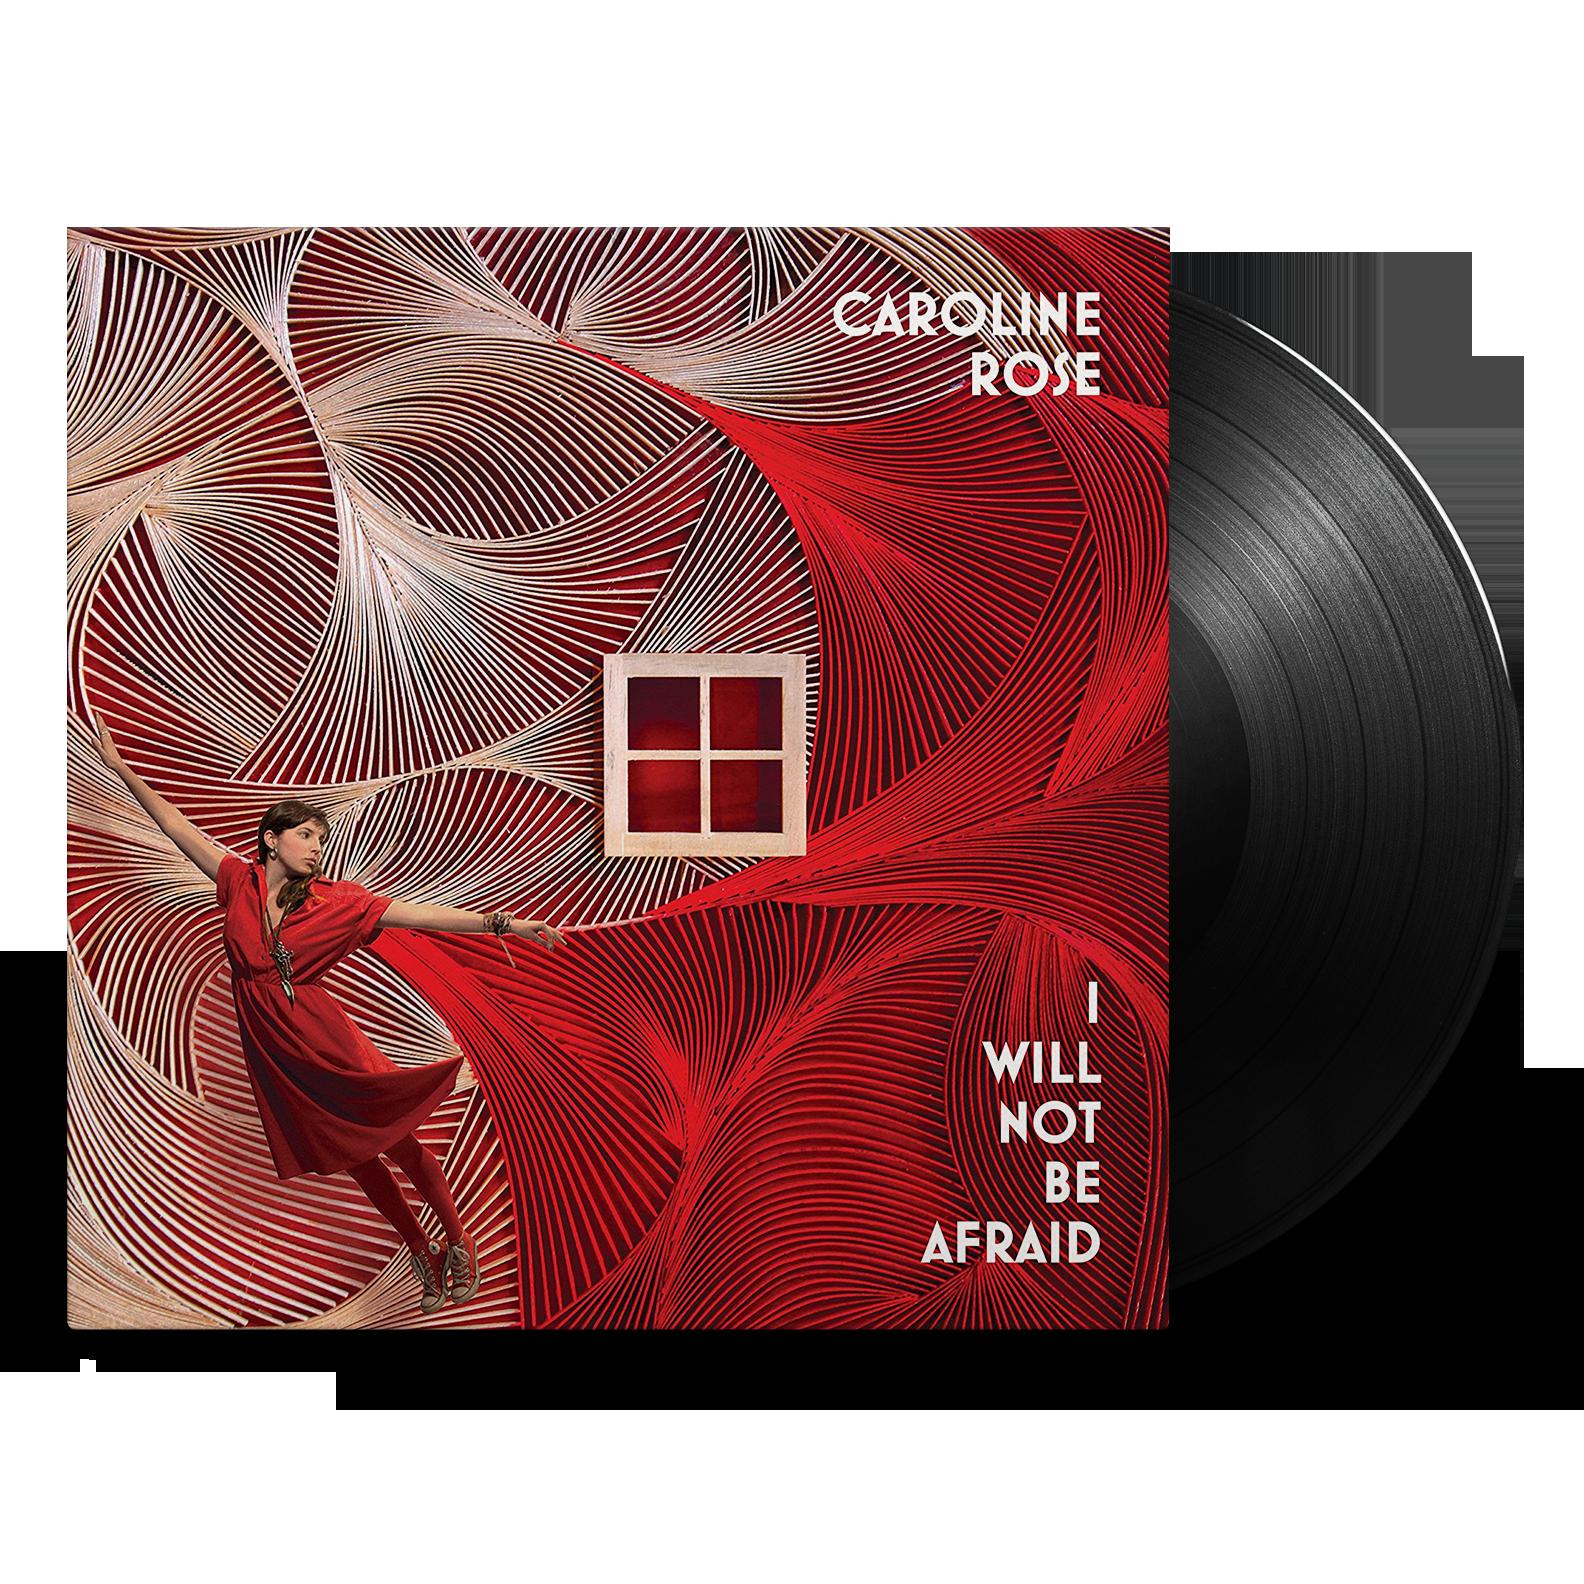 I will Not Be Afraid  on vinyl